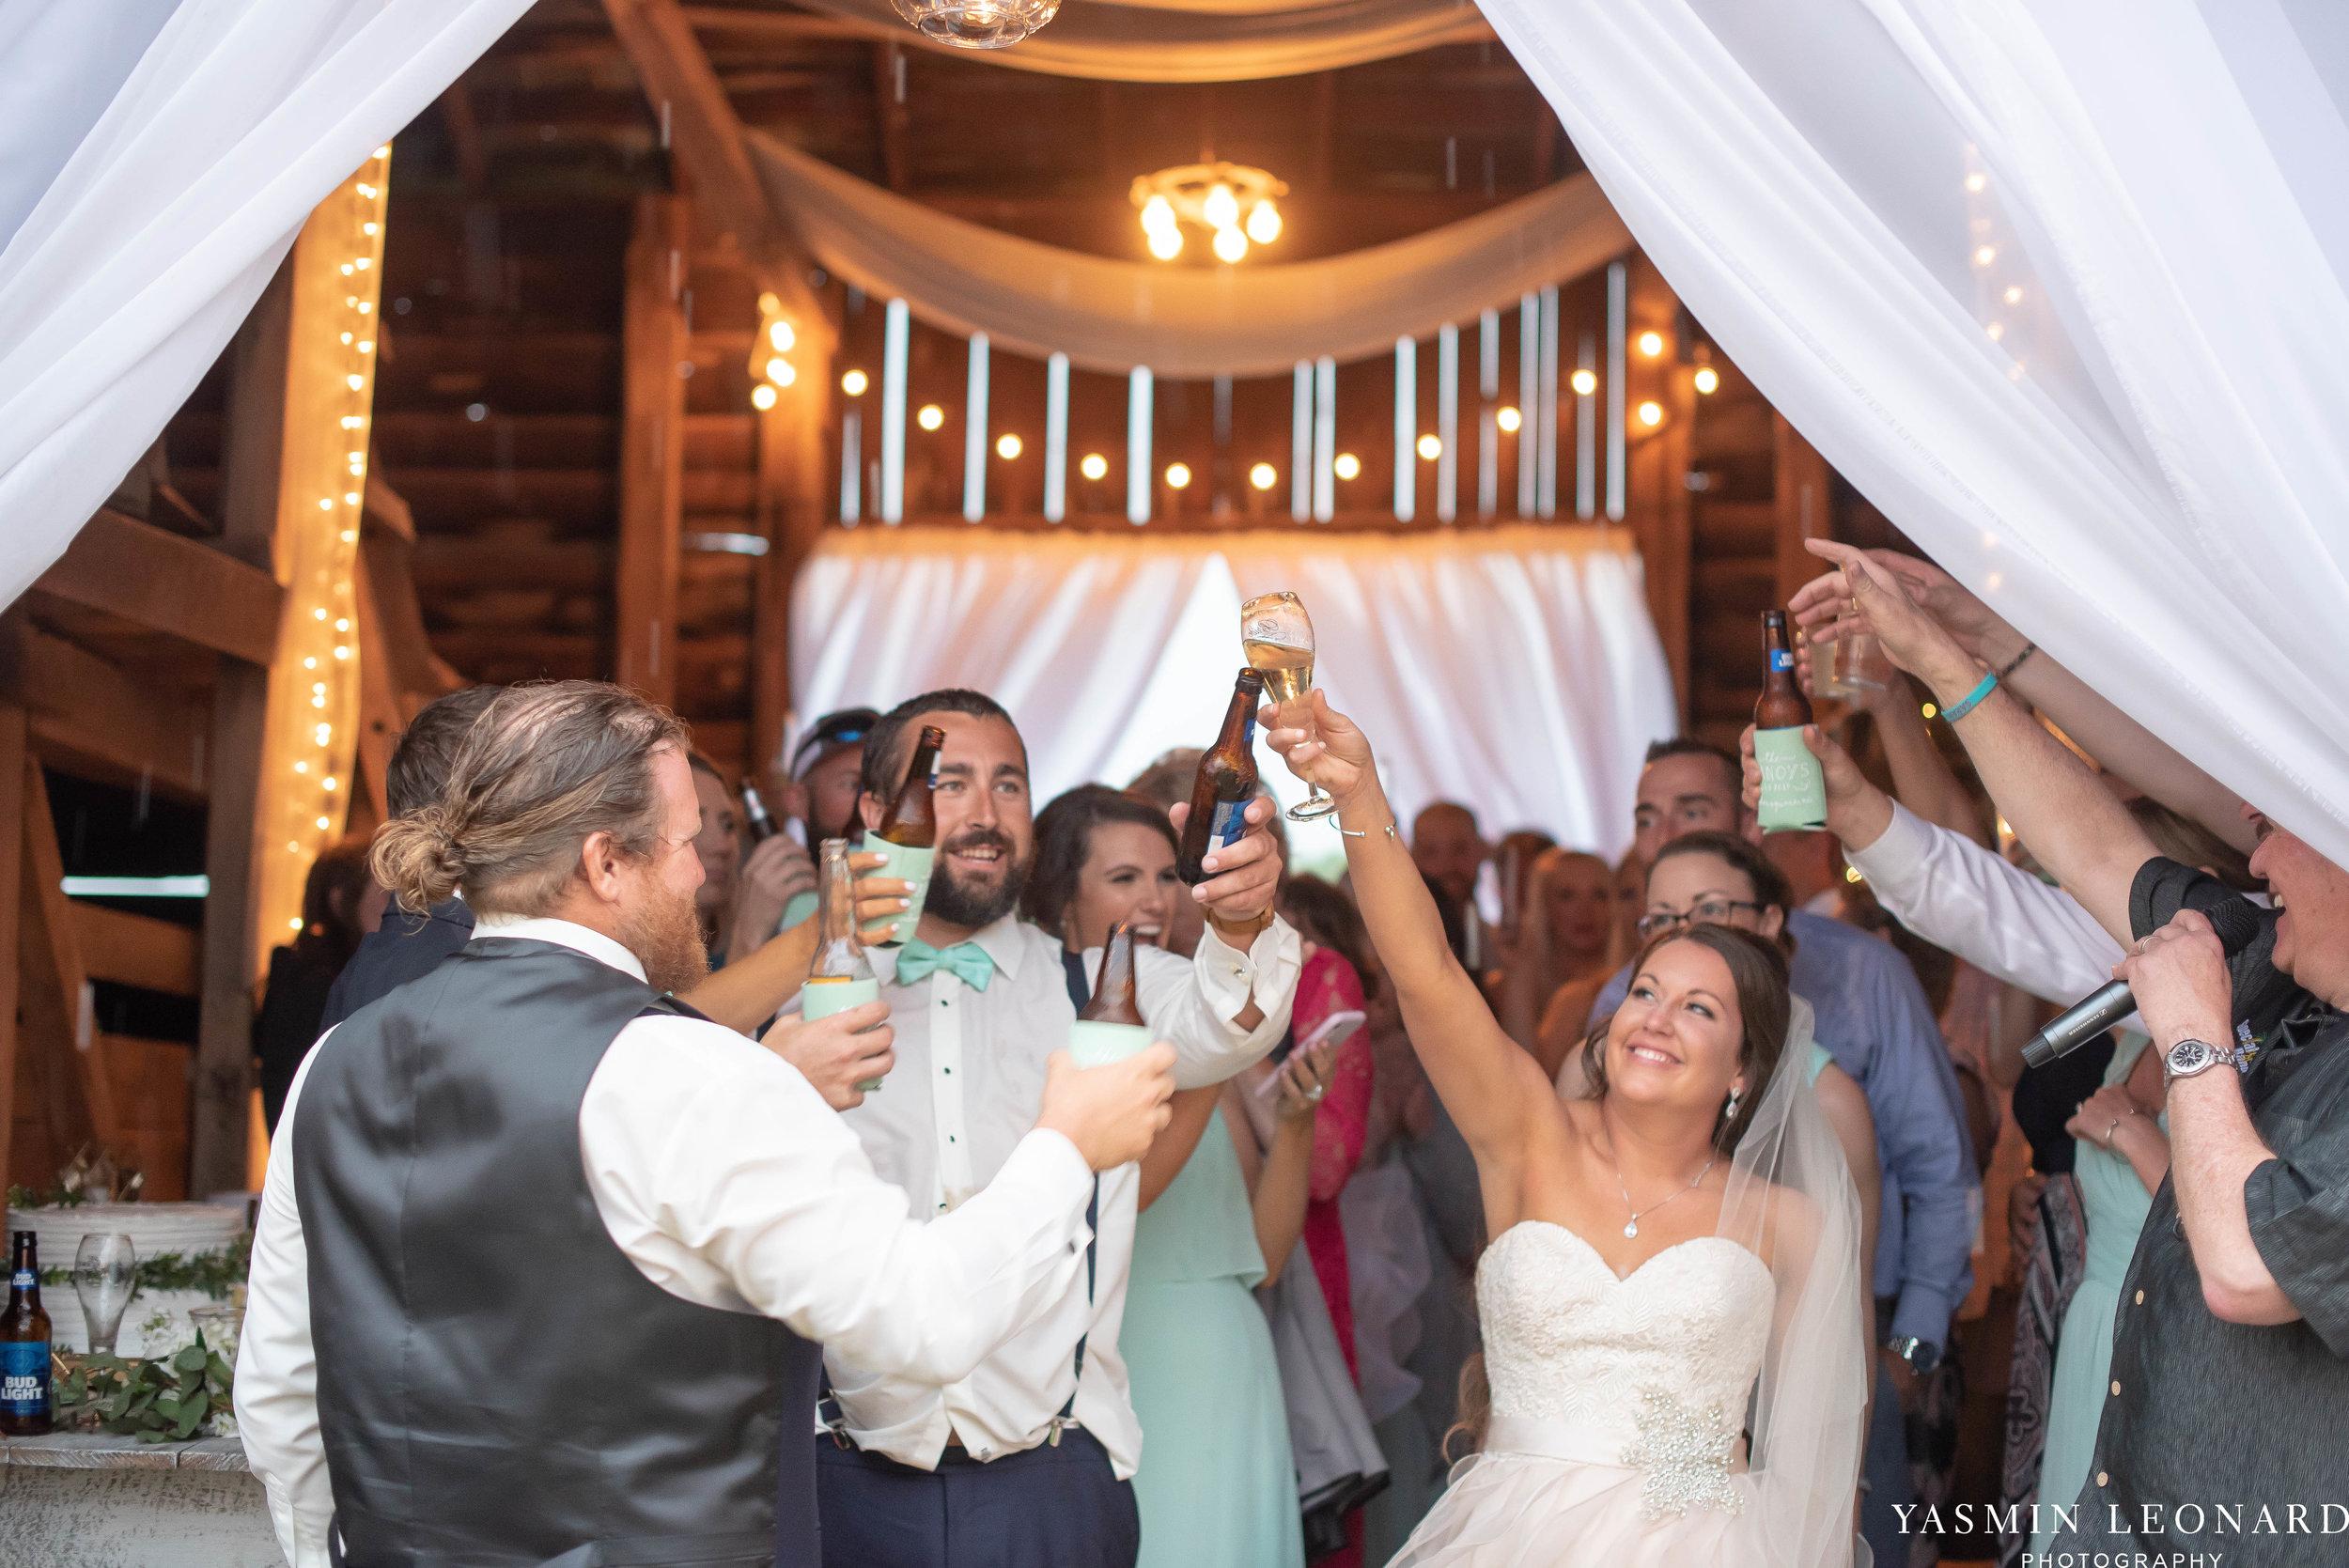 Rain on your wedding day - Rainy Wedding - Plan B for Rain - What to do if it rains on your wedding day - Wedding Inspiration - Outdoor wedding ideas - Rainy Wedding Pictures - Yasmin Leonard Photography-72.jpg